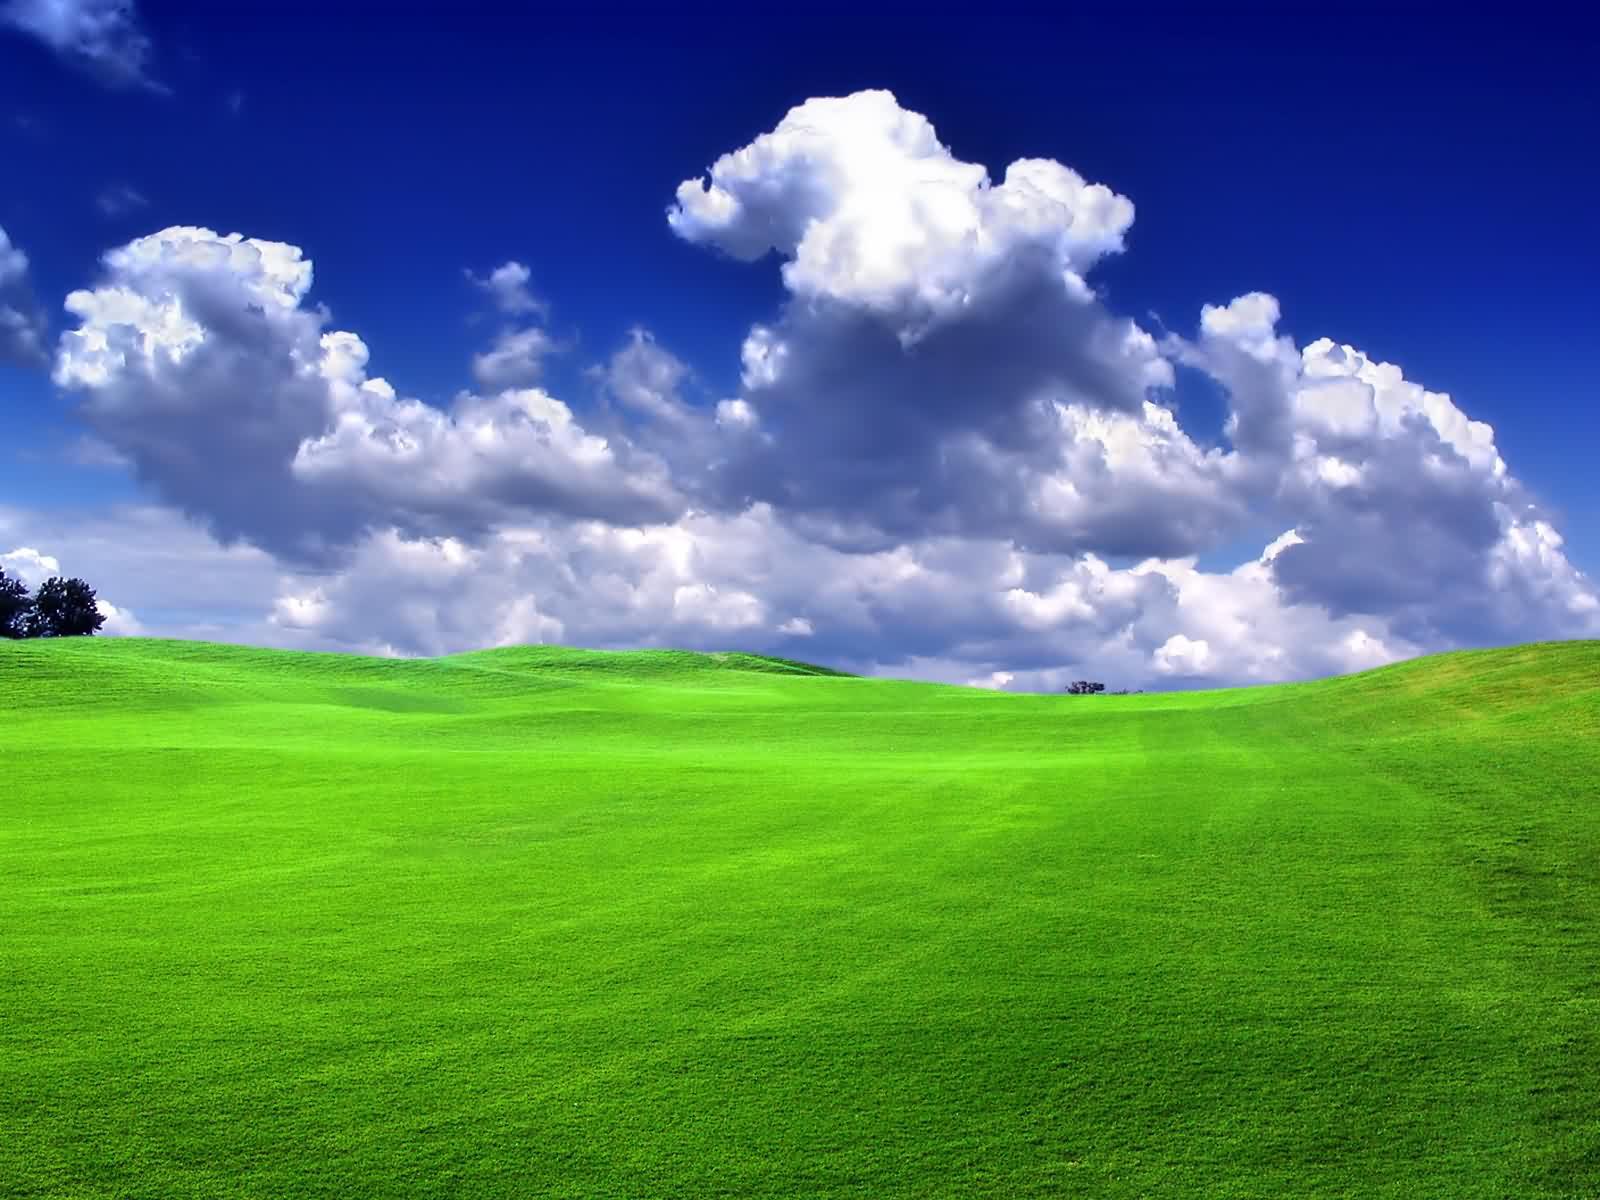 http://4.bp.blogspot.com/-RAF4bvsgUVg/Teh1KYJJcZI/AAAAAAAAAs4/uPaKhs55ZqI/s1600/nature%2Bwallpaper%2Bhd%2B%2B1.jpg